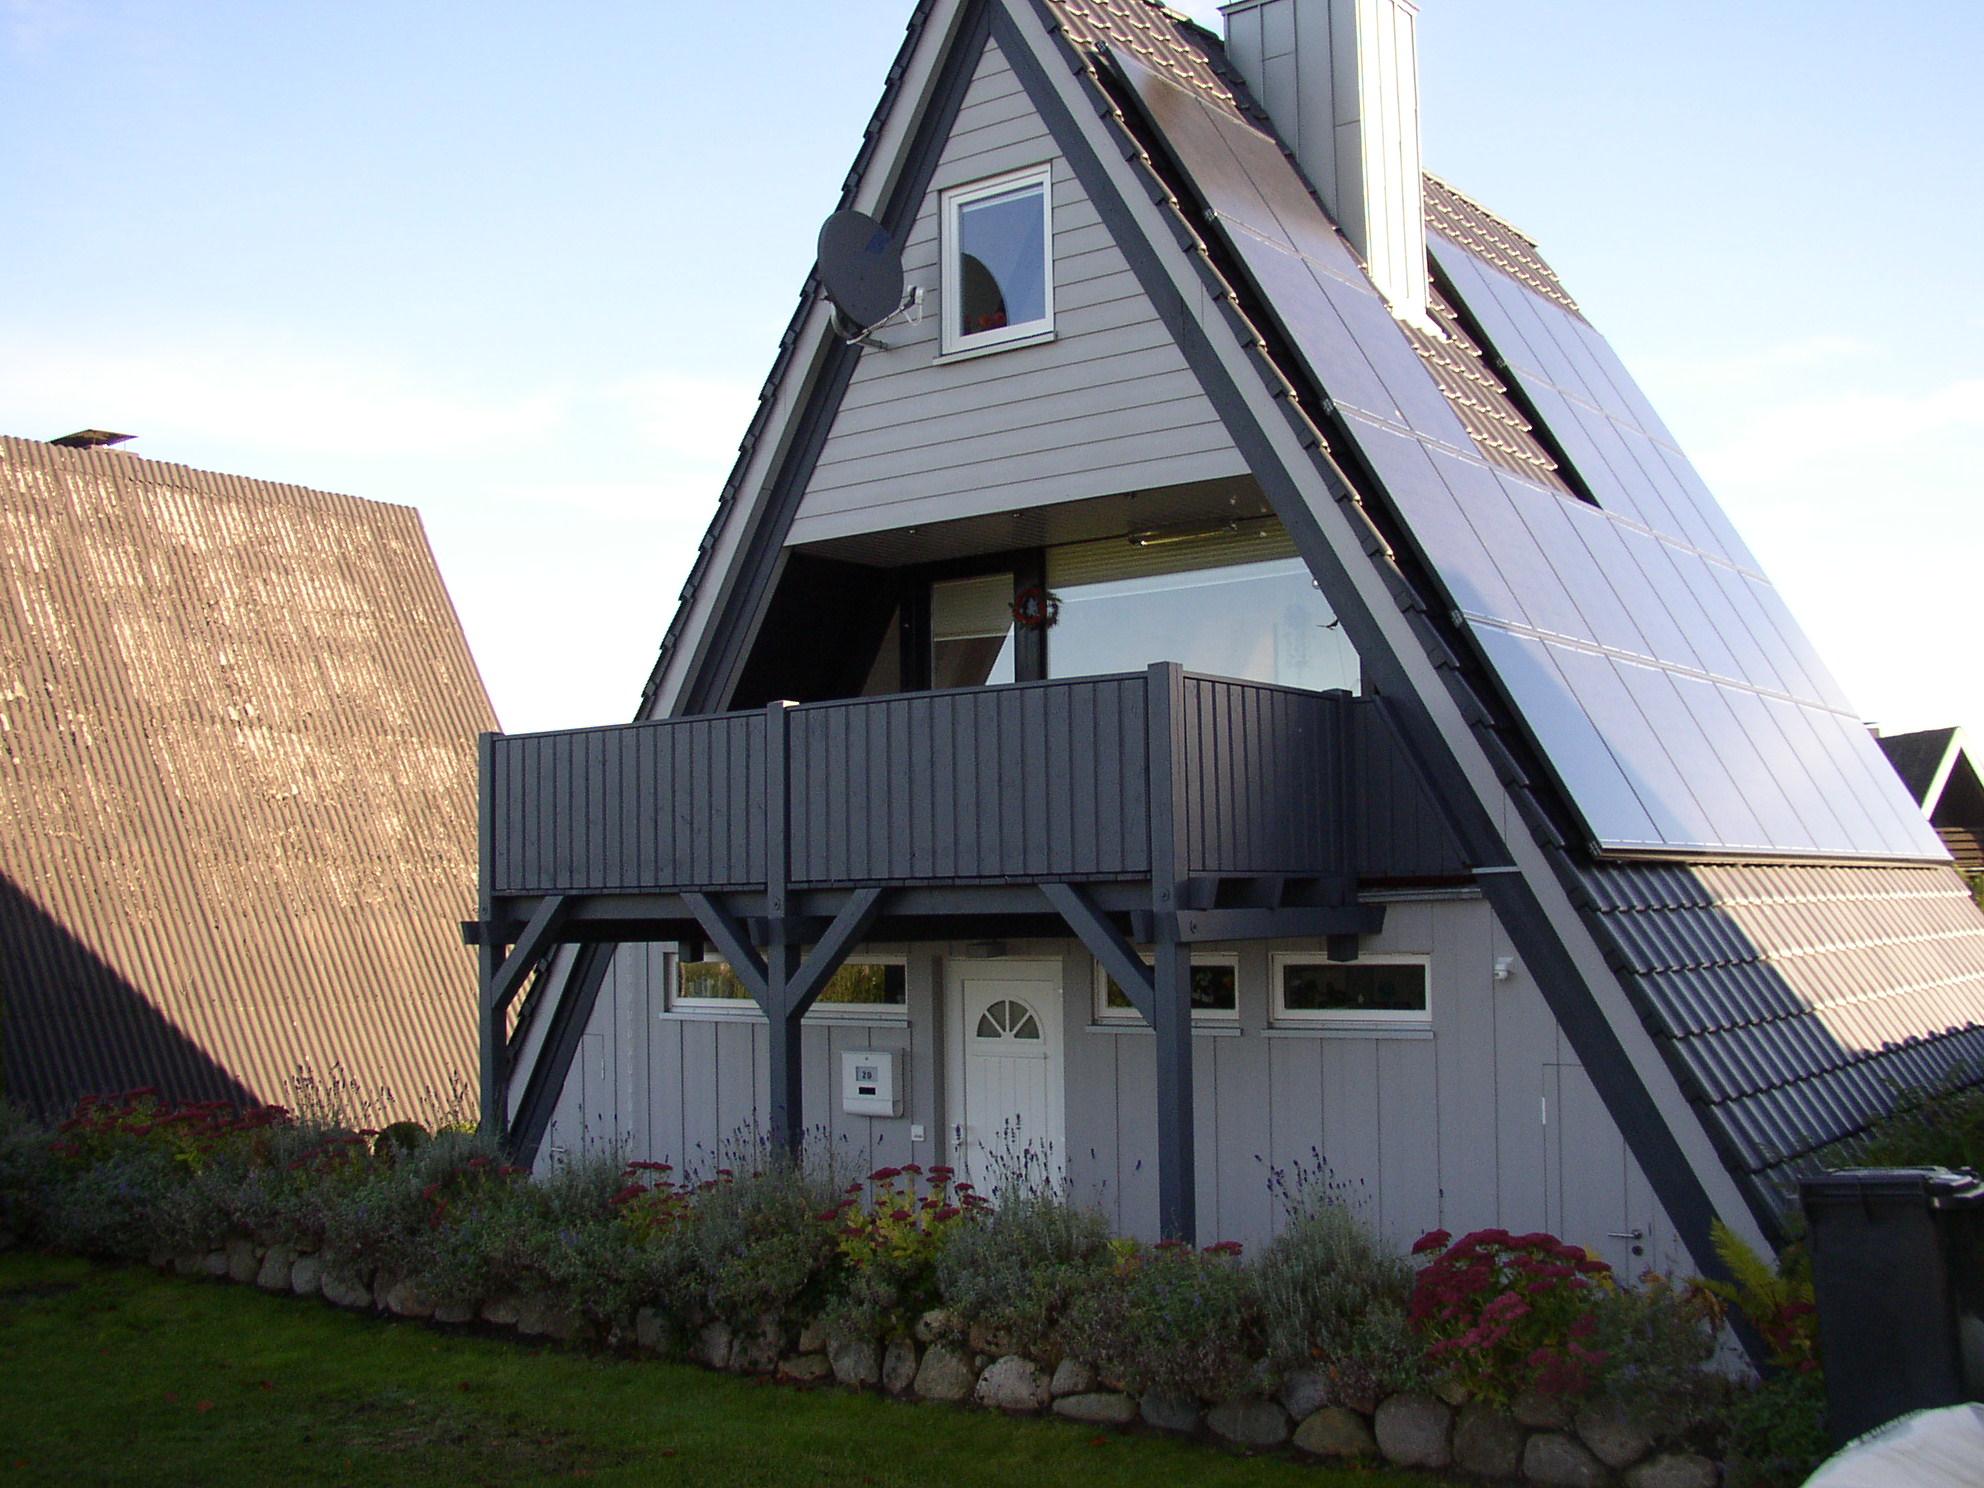 balkone zimmerei wischh fer gmbh co kg. Black Bedroom Furniture Sets. Home Design Ideas